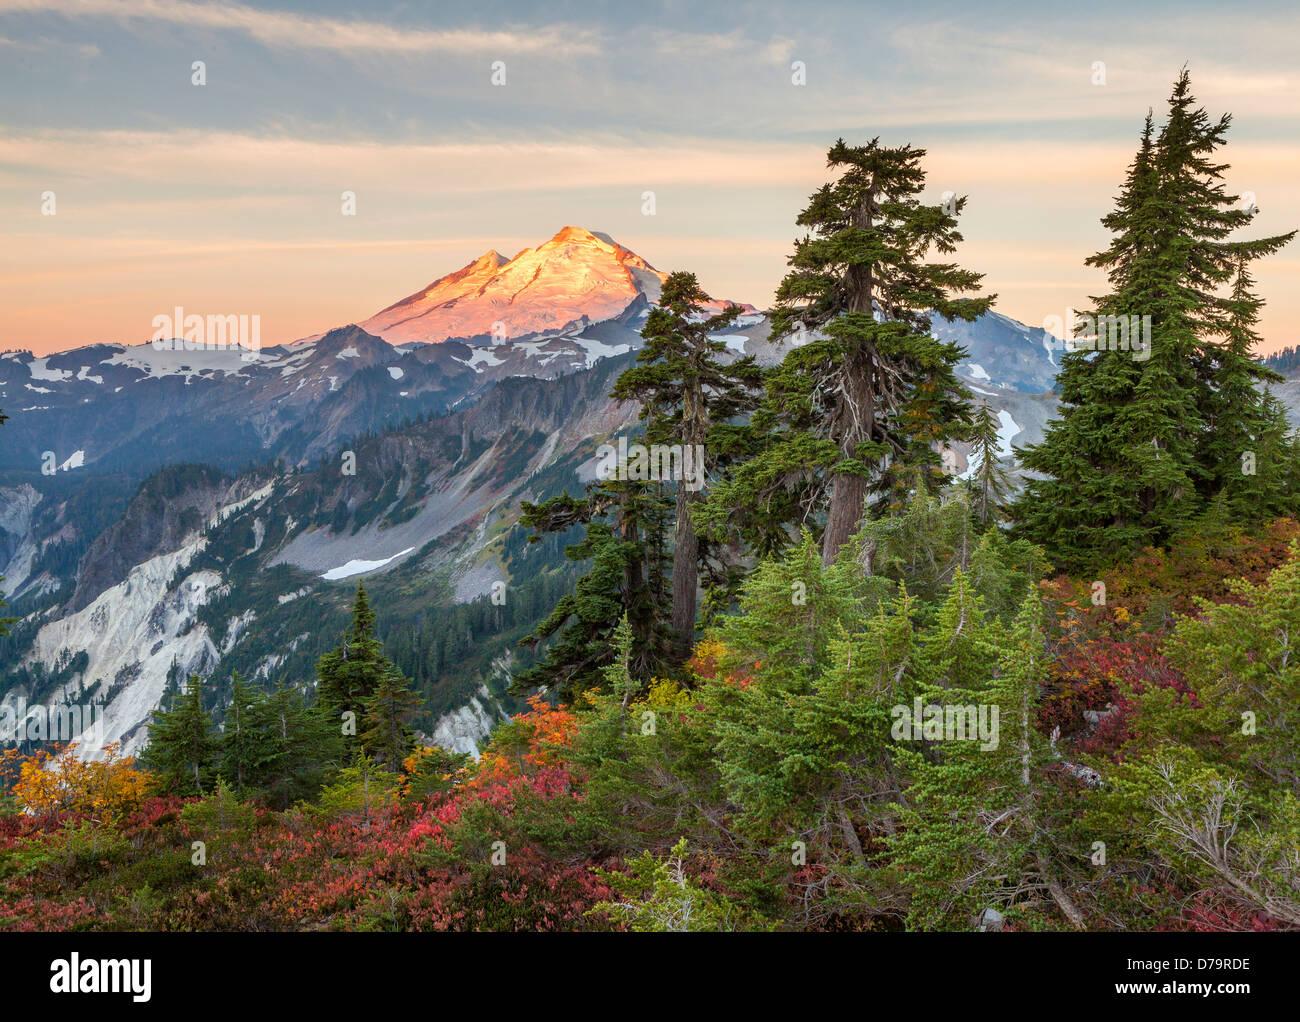 Monte Baker-Snoqualmie National Forest, WA: Mount Baker de artistas Ridge Trail, al amanecer. Imagen De Stock